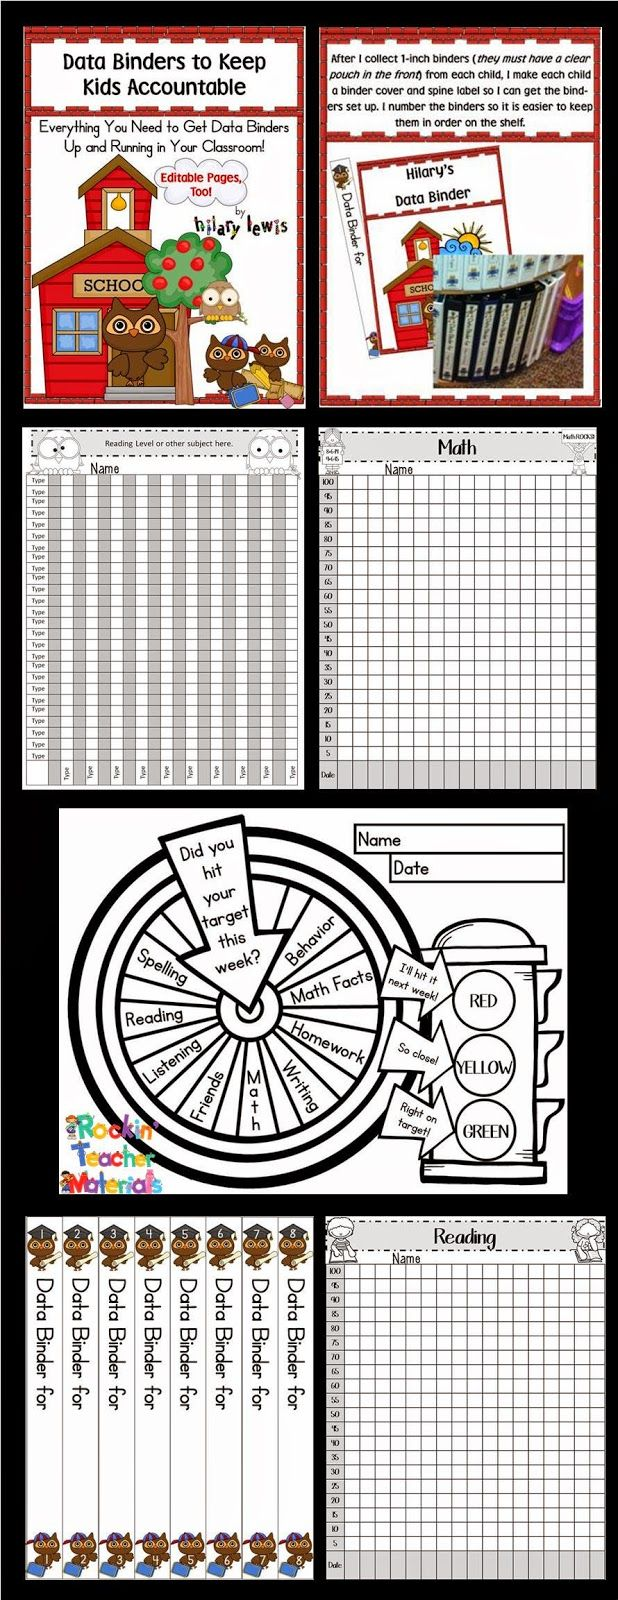 Rockin' Teacher Materials: Do You Do Data Binders? See How I Do & Freebie!